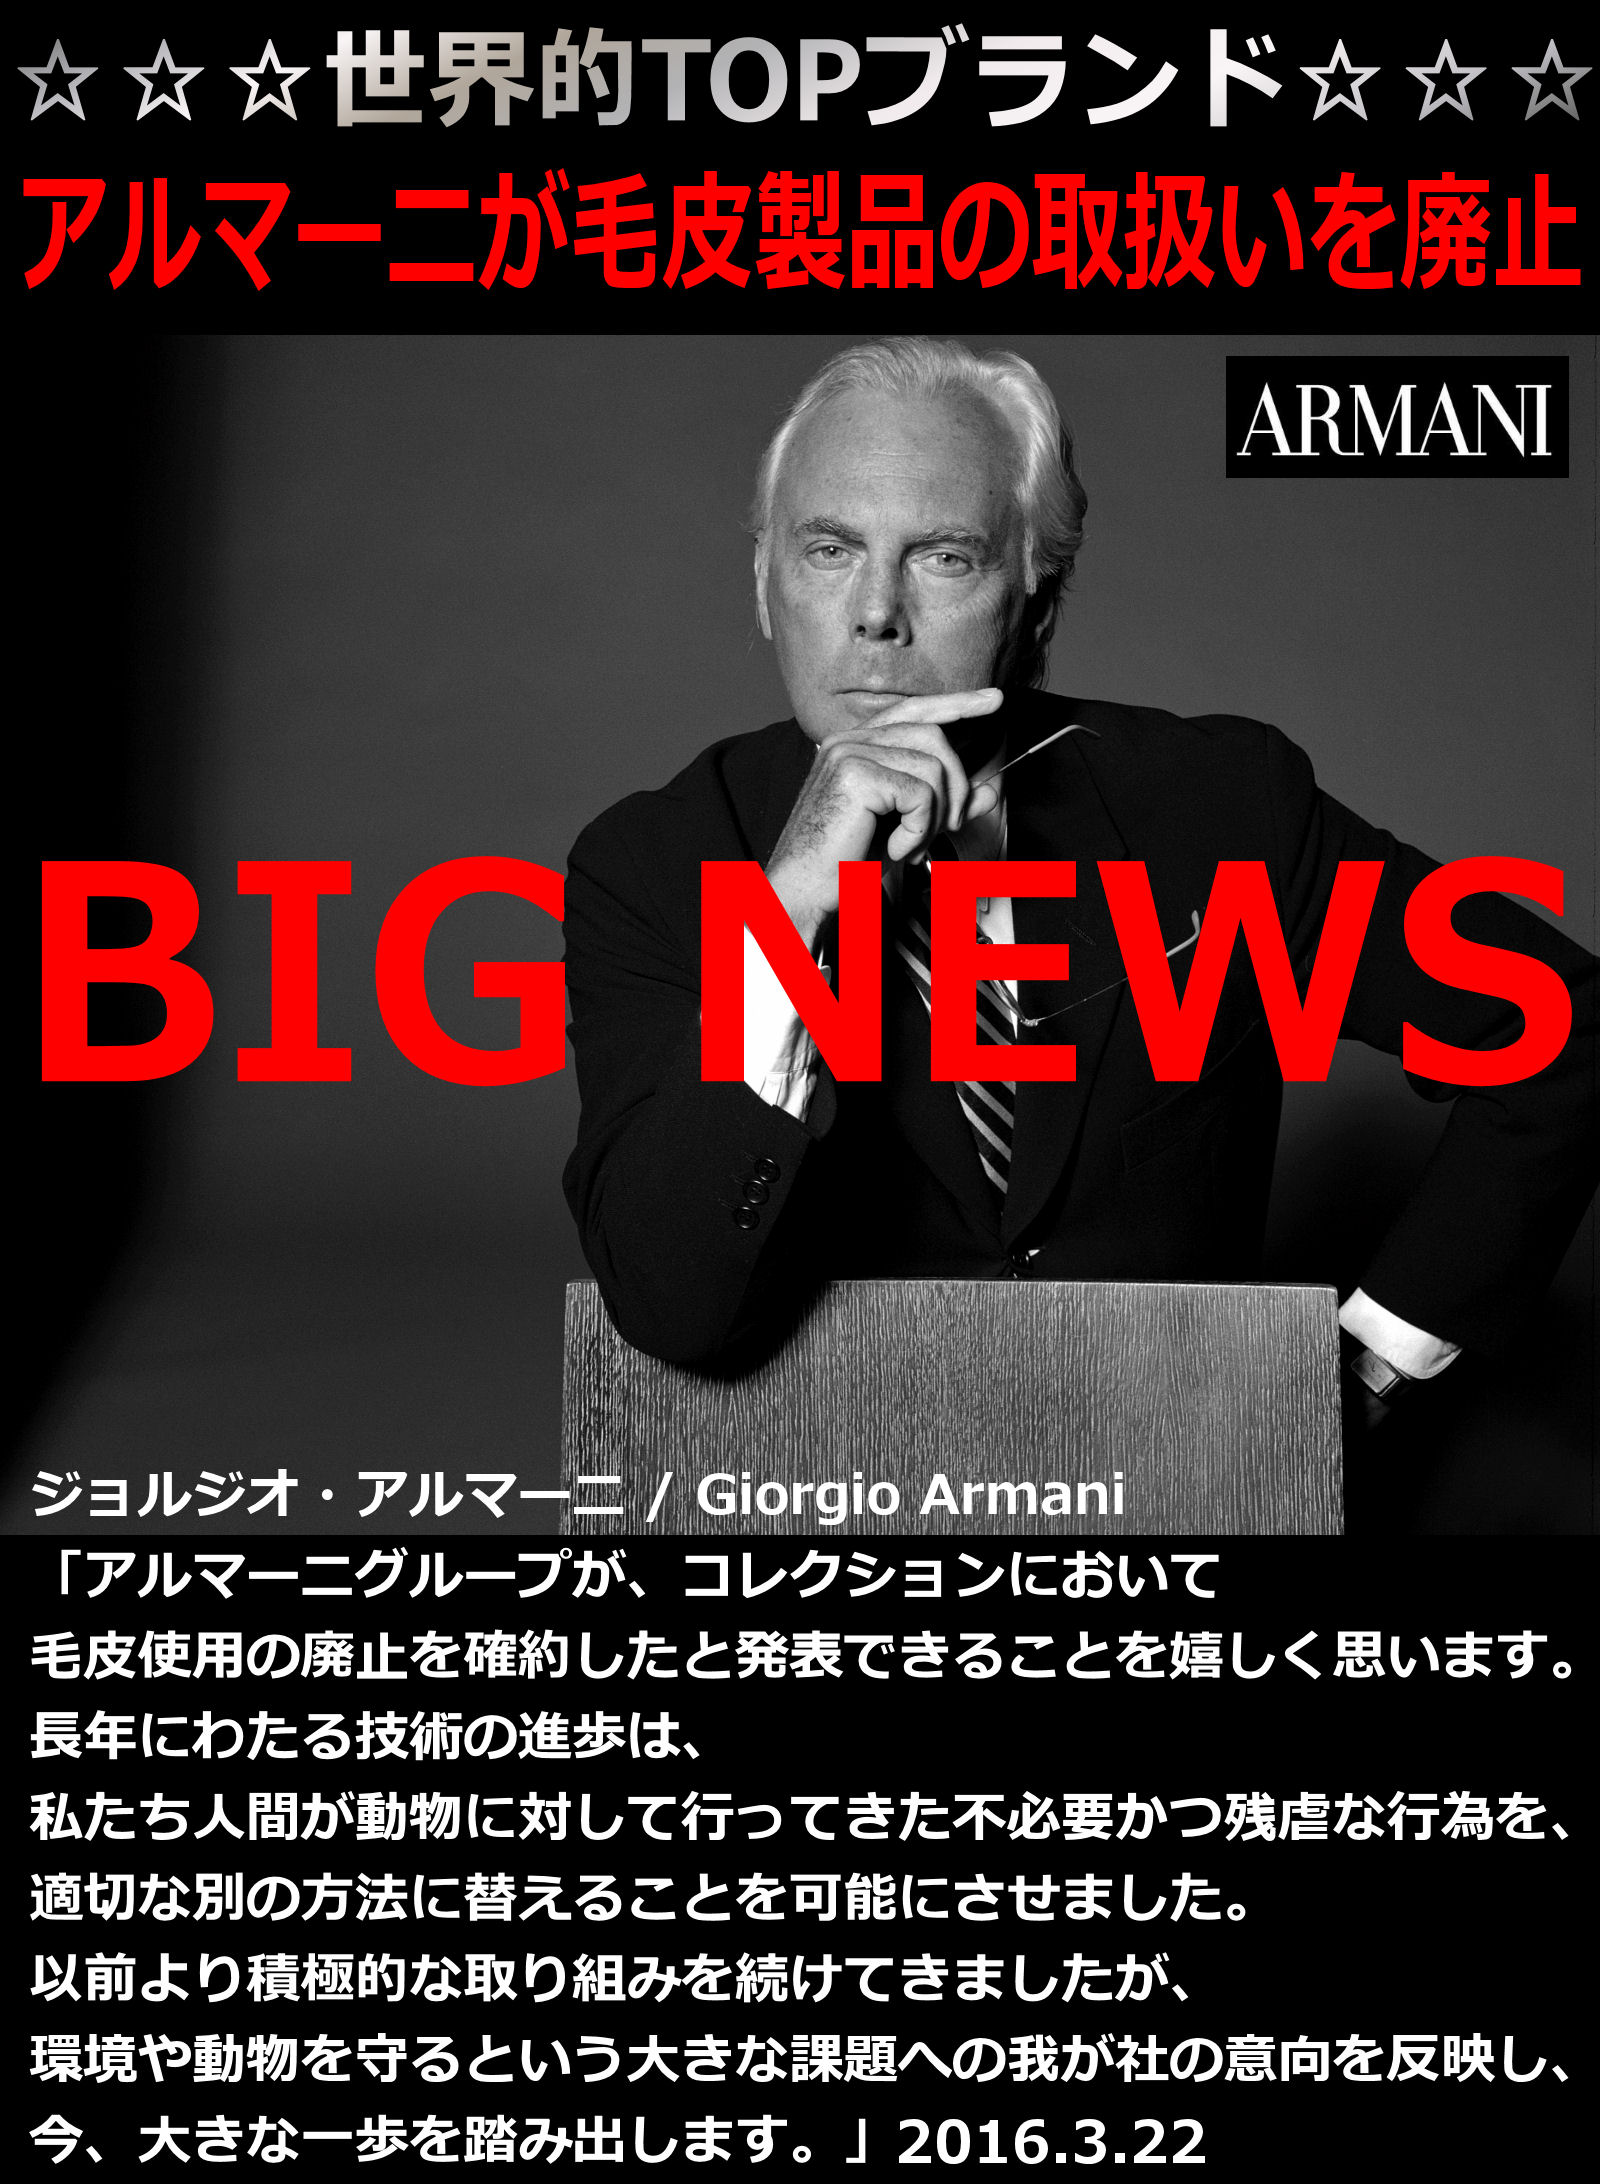 ARMANIp.jpg